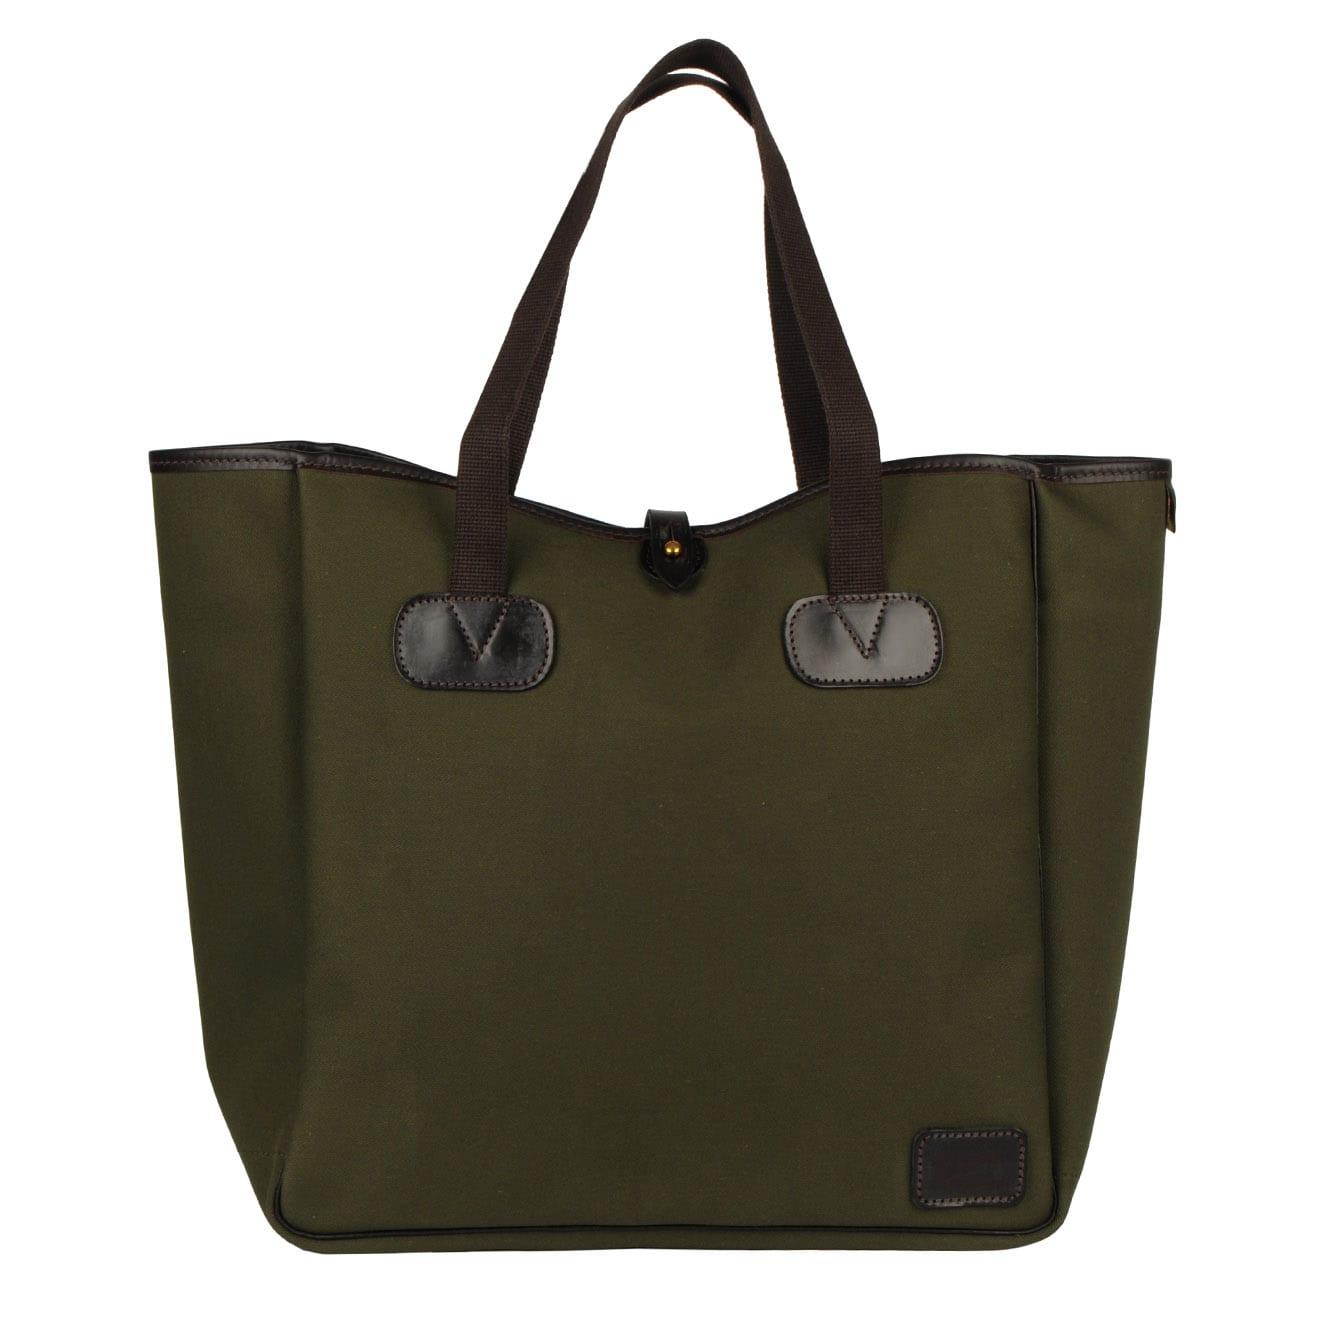 Brady Classic Tote Bag Olive